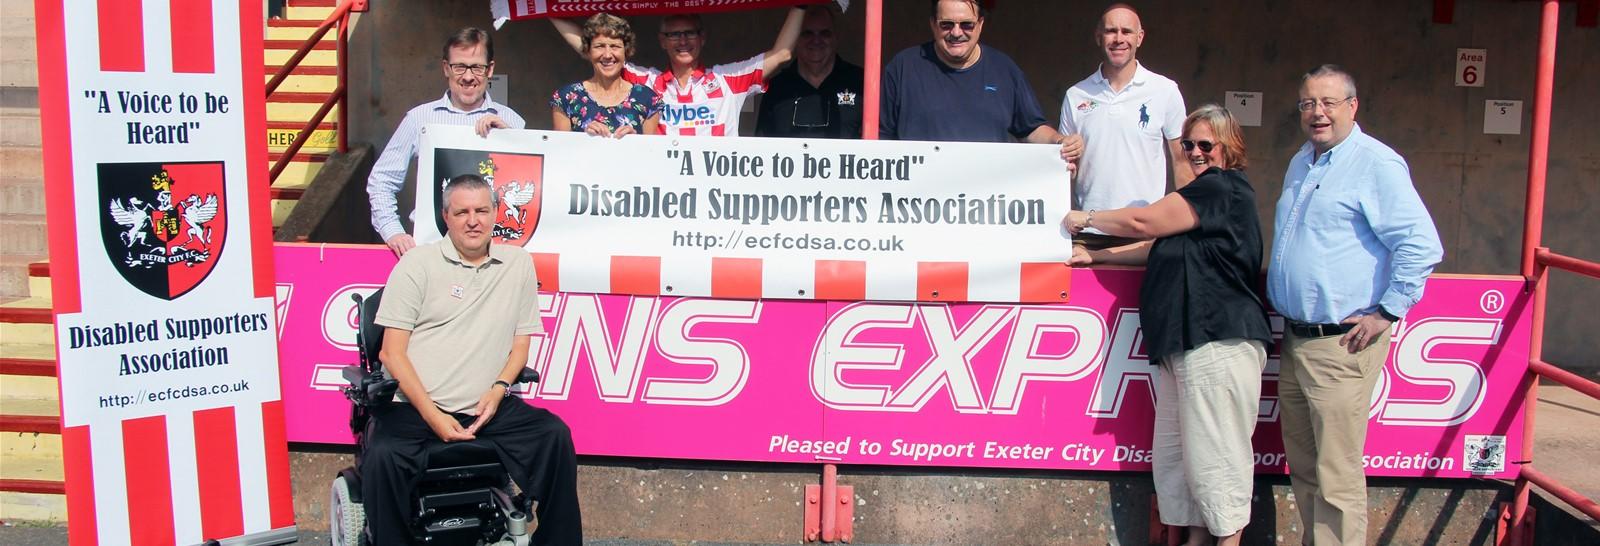 New banners for ECDSA